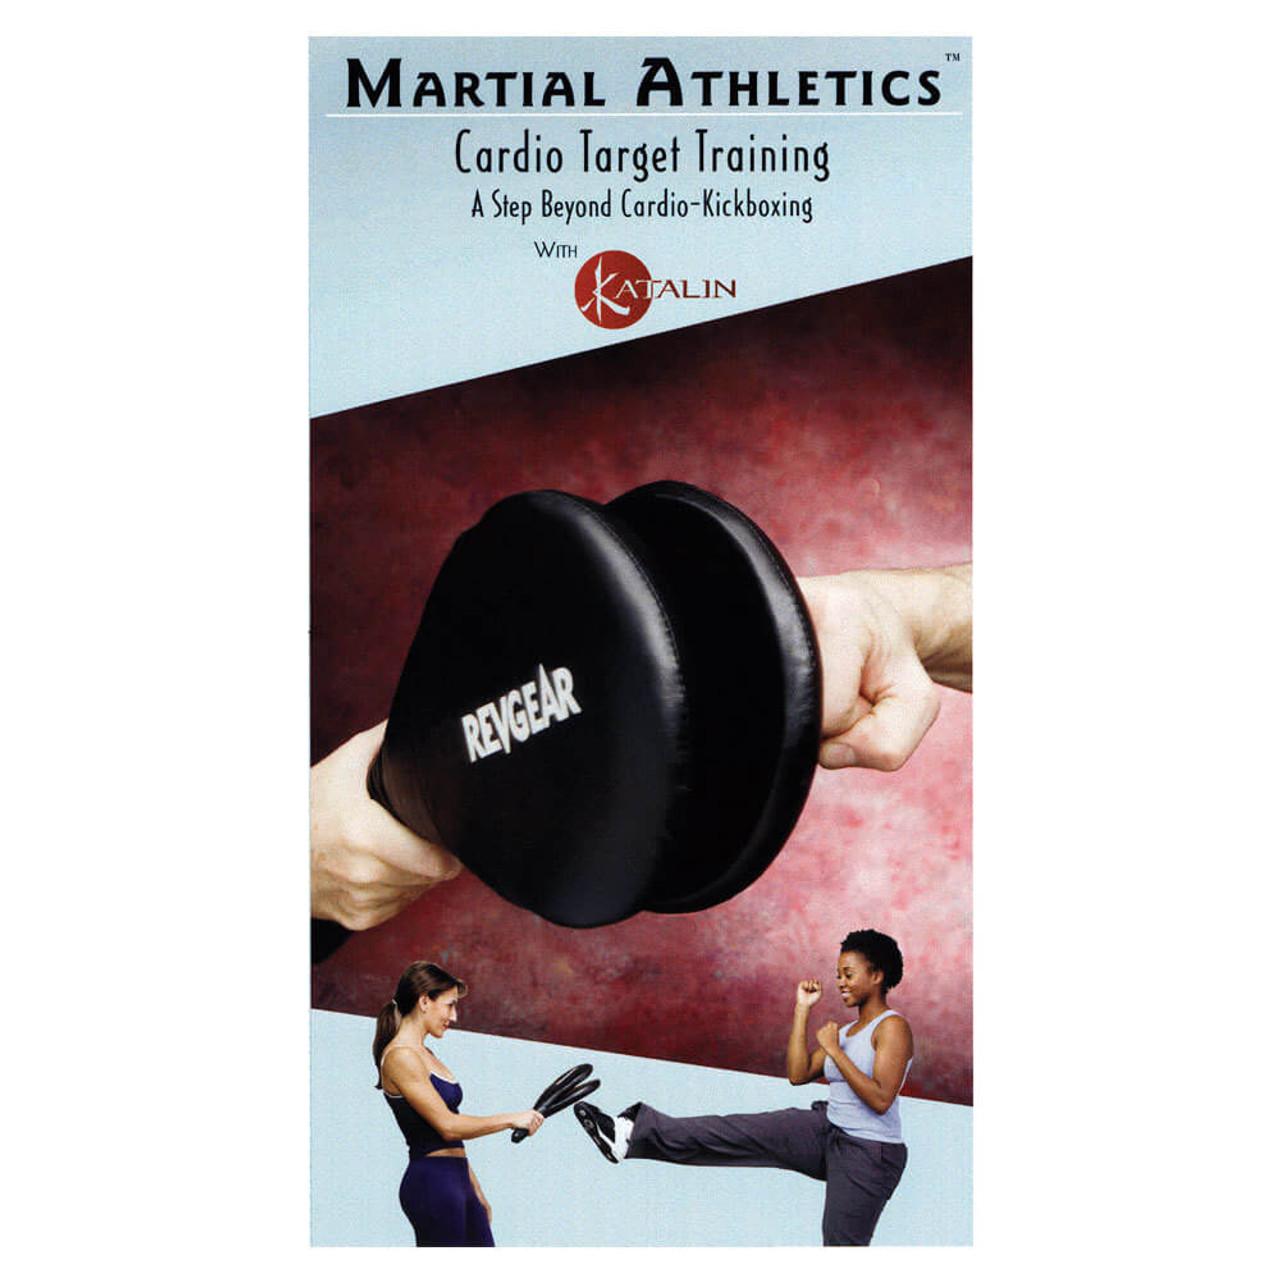 Cardio Target Training Video - DVD